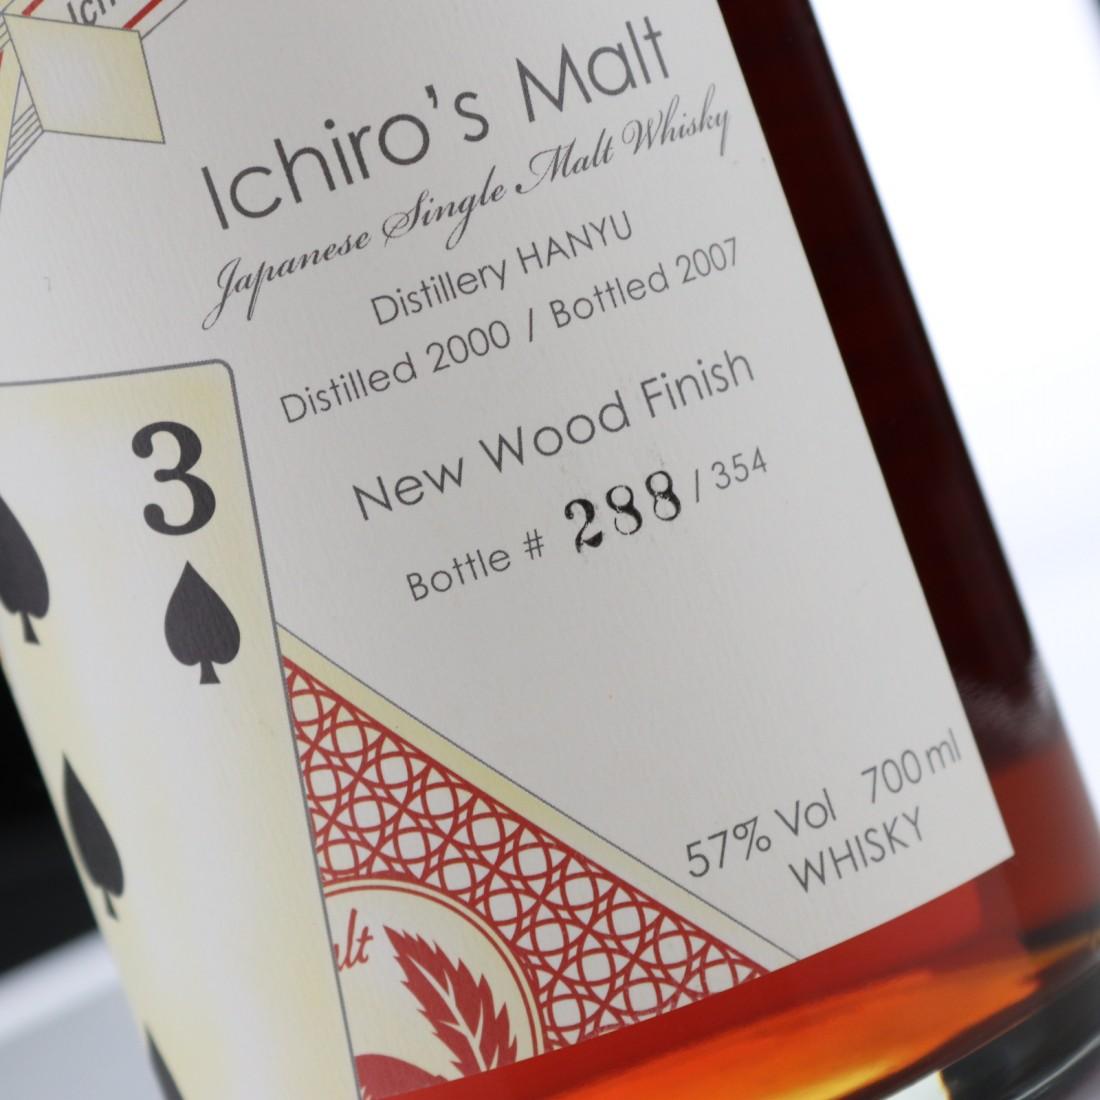 Hanyu 2000 Ichiro's Malt 'Card' #7000 / Three of Spades